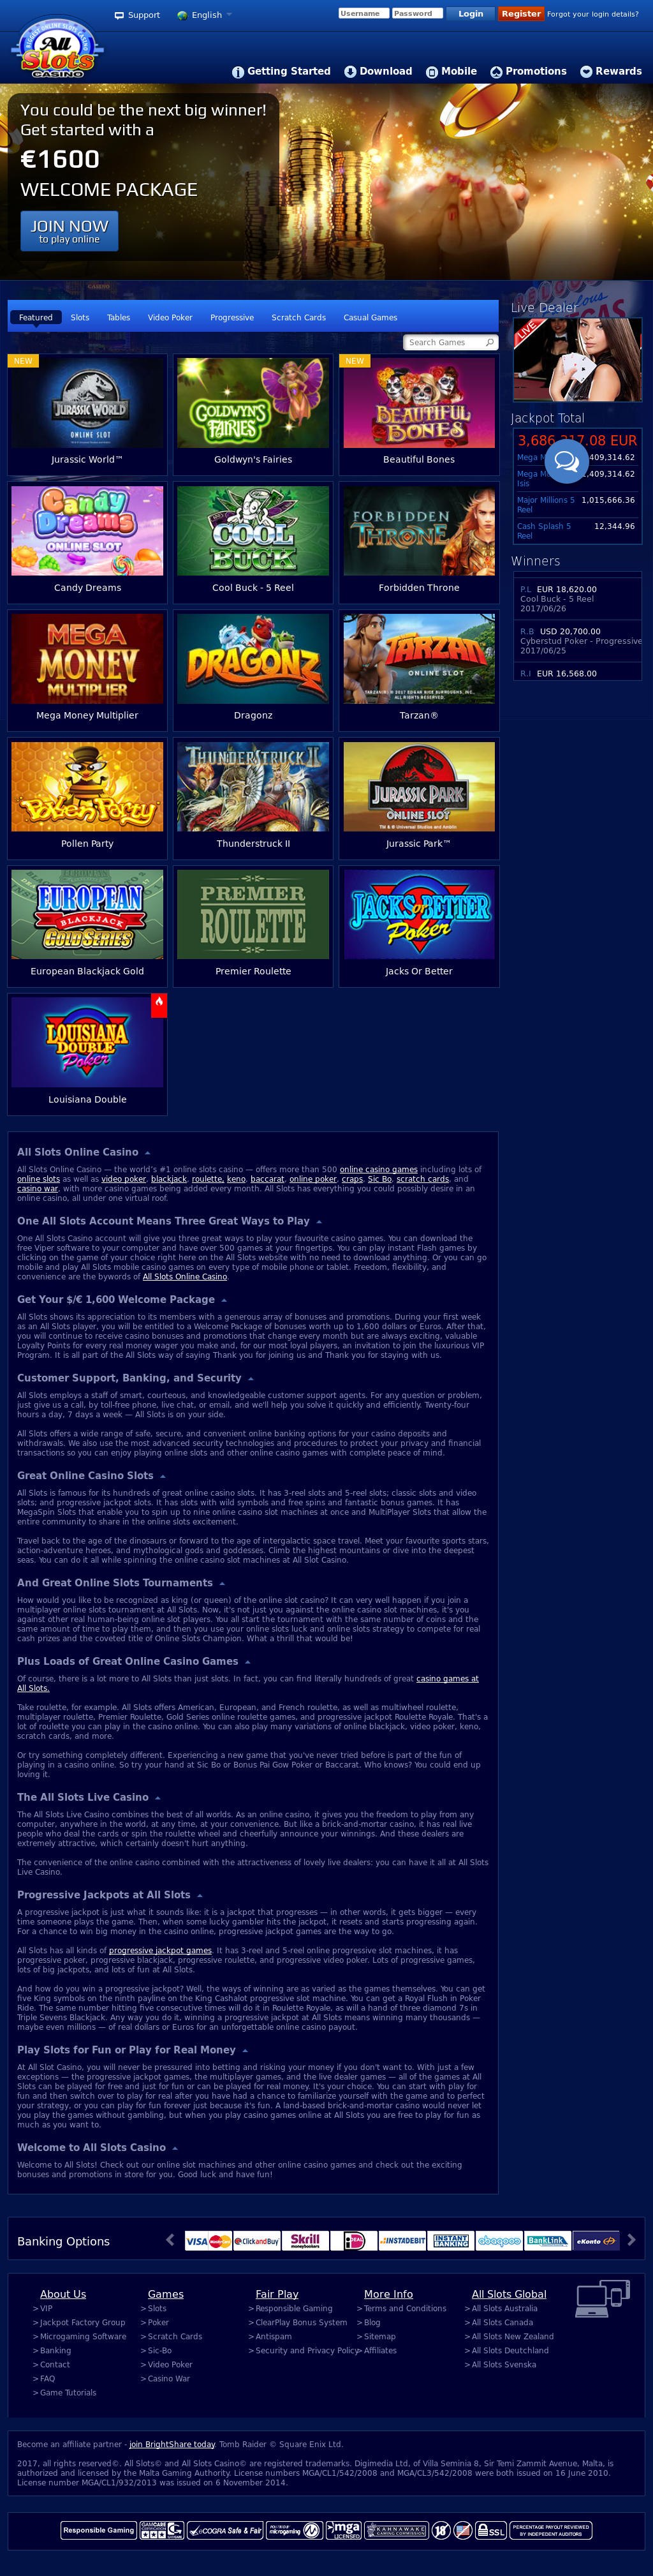 free casino slots no download